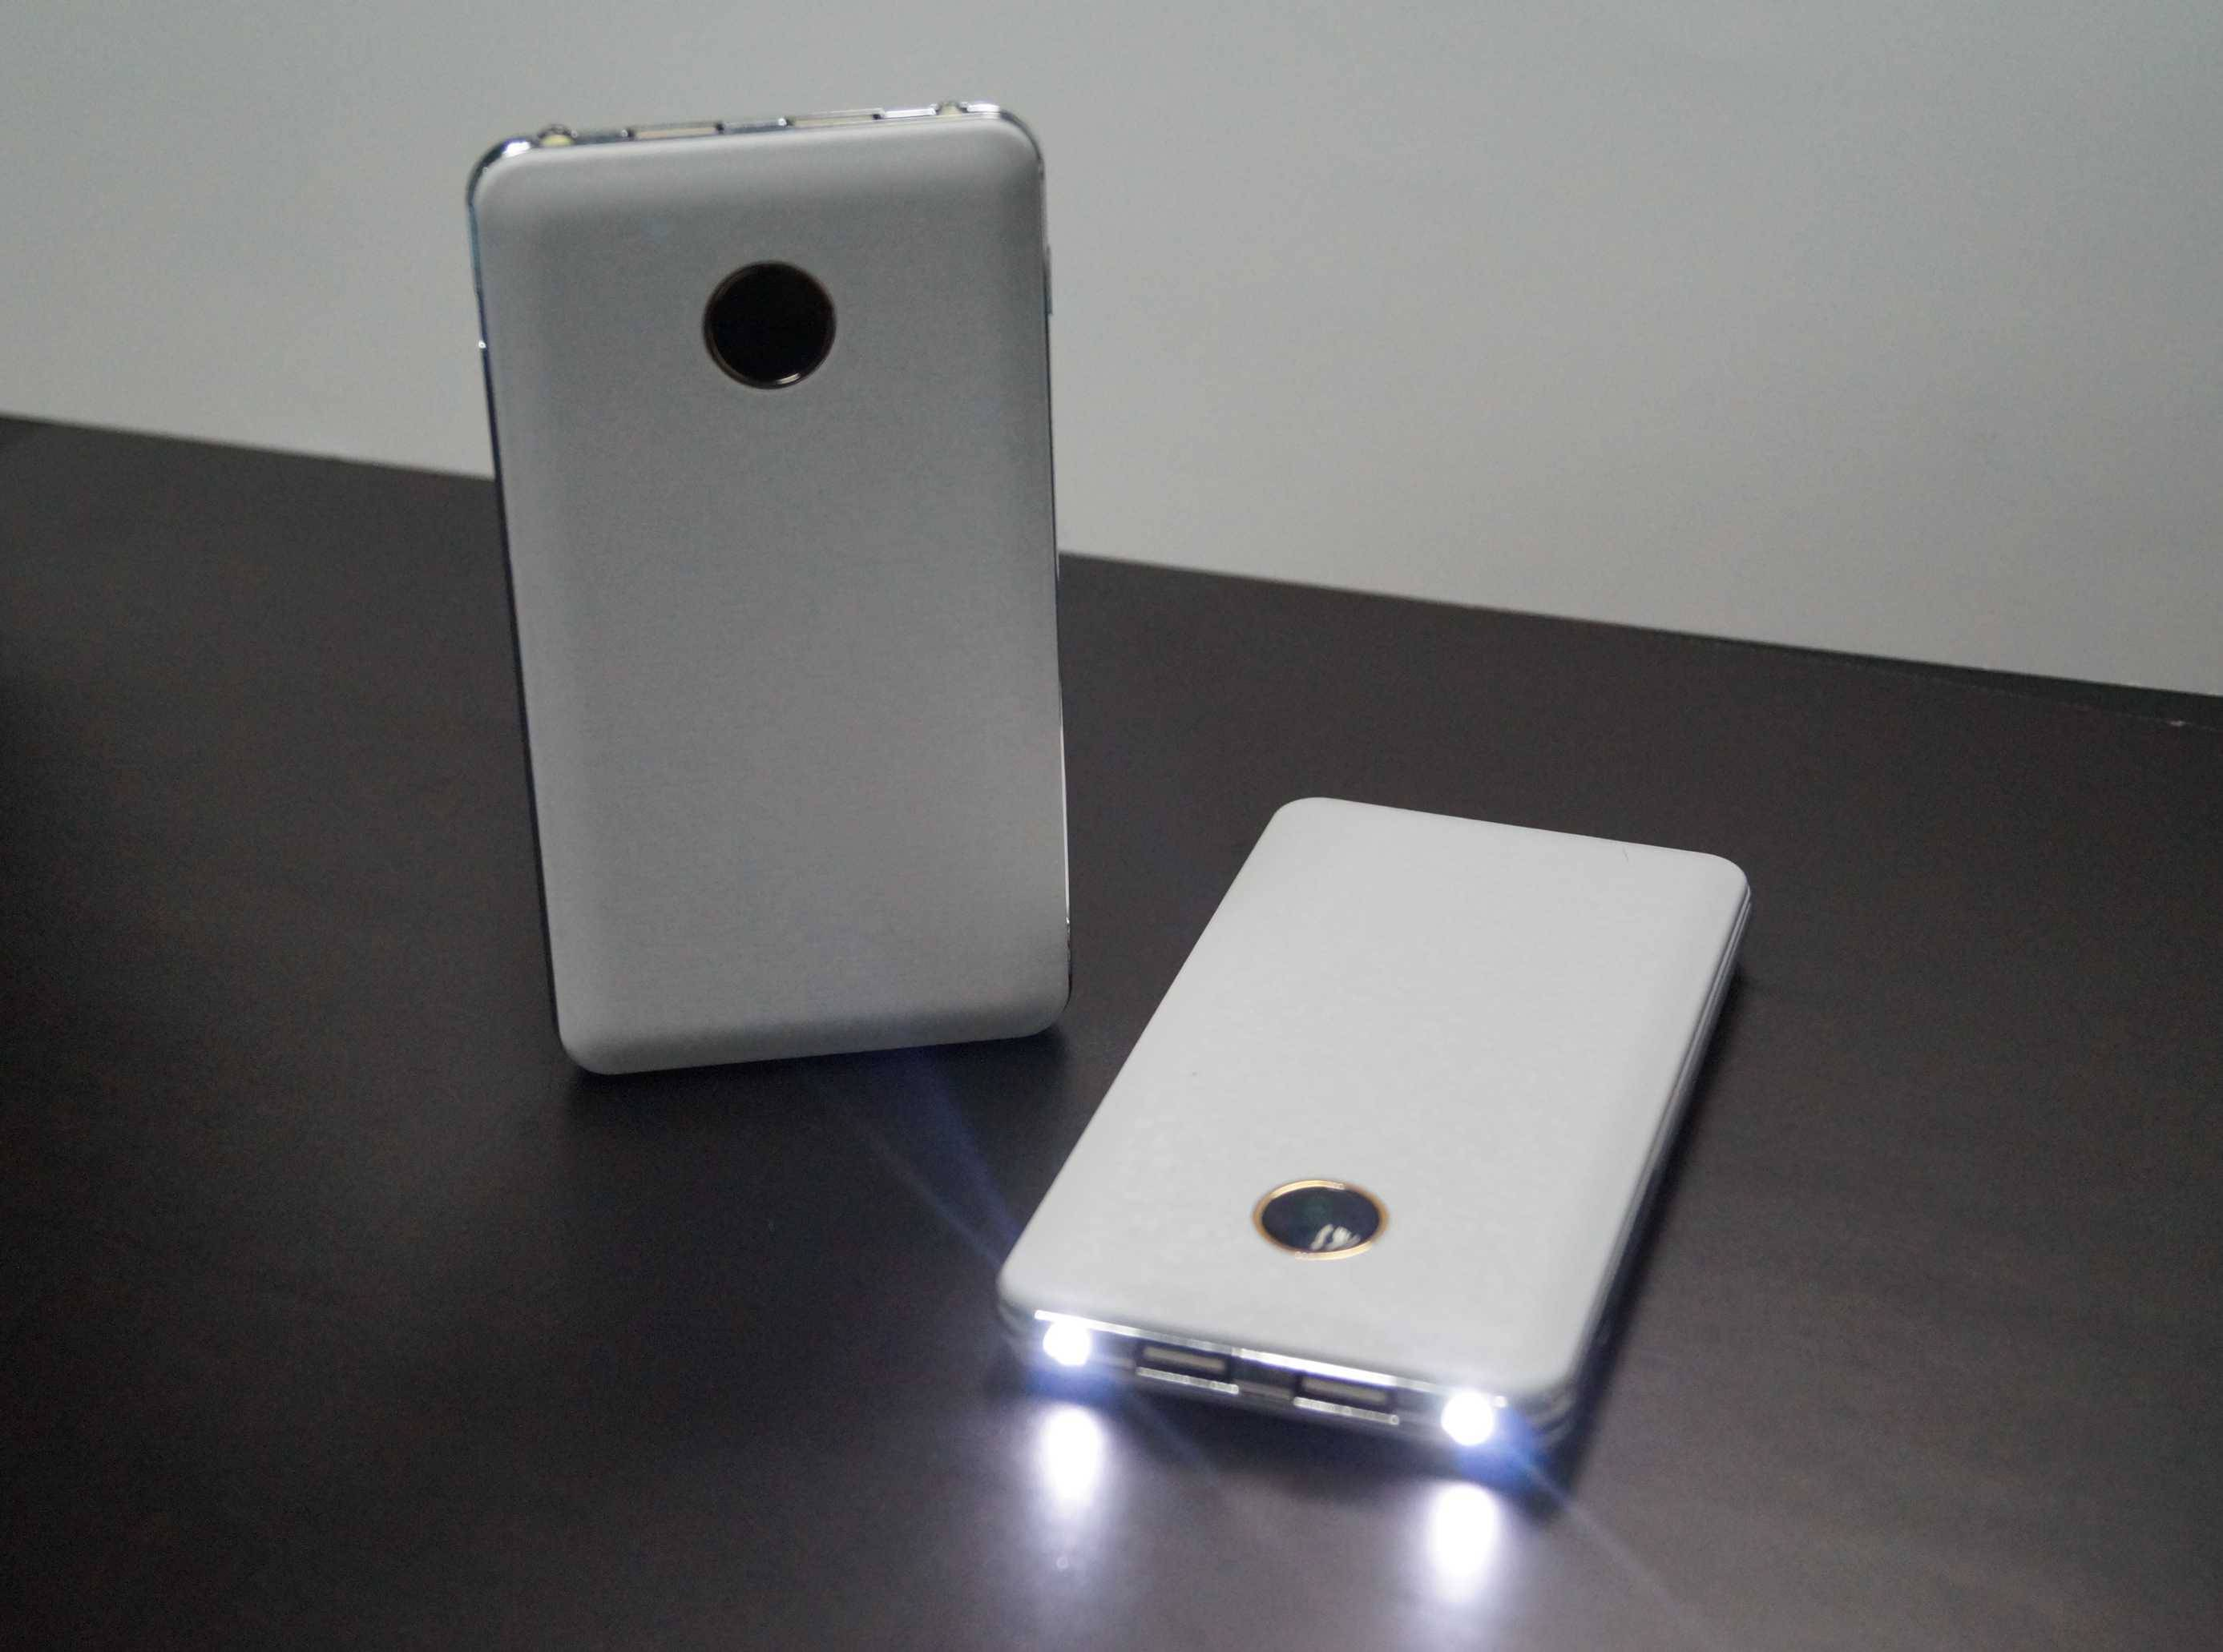 Portable Mobile Charger 6500 mAh